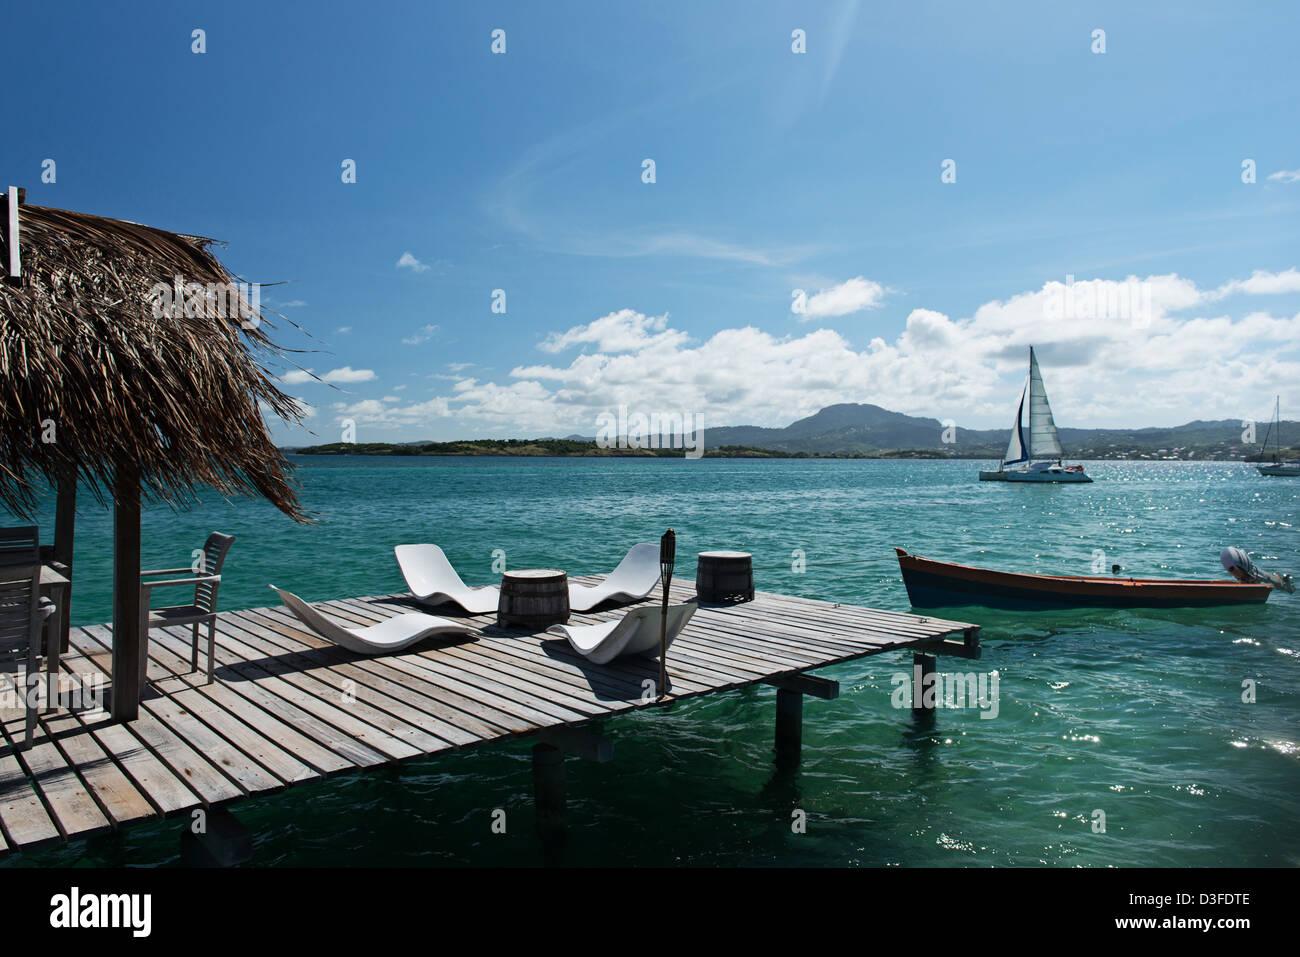 Ilet Oscar Insel Martinique, Karibik, Frankreich Stockbild